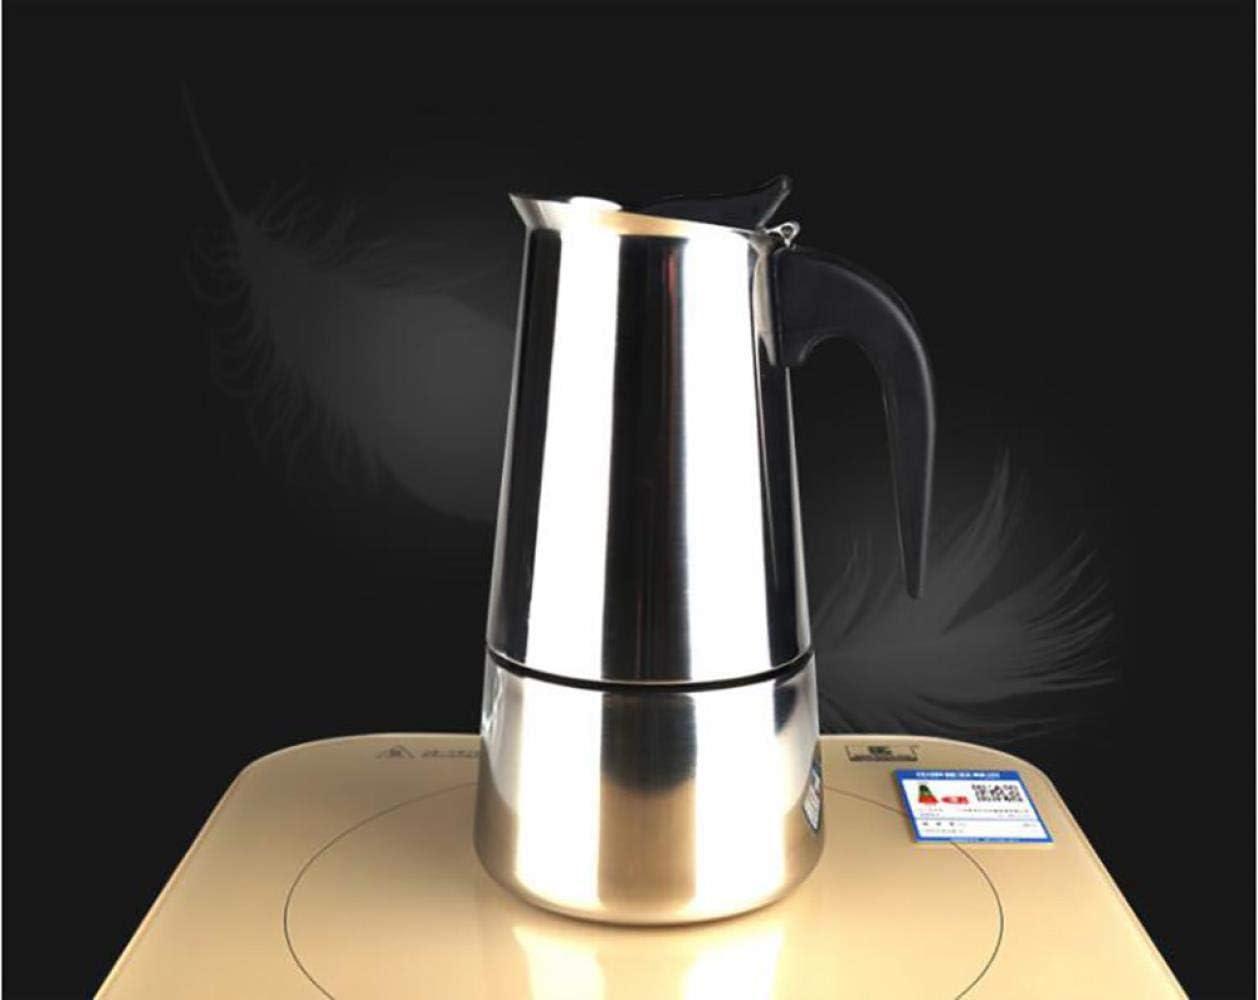 Cafetera espresso italiana de acero inoxidable 304, olla Moka ...